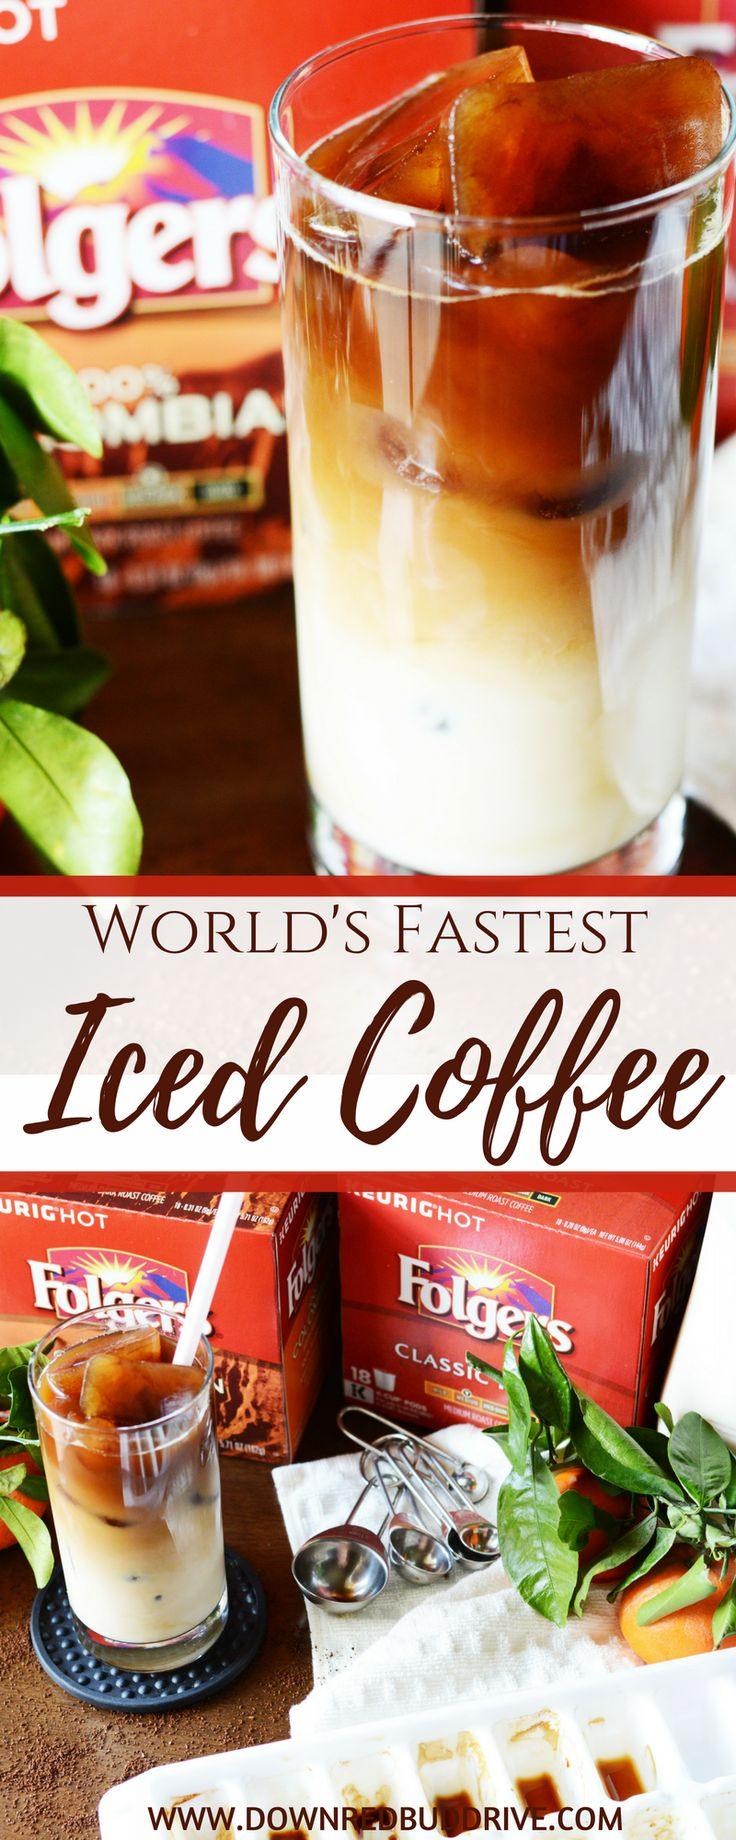 World's Fastest Iced Coffee Recipe | Iced Coffee | Iced Coffee Recipe | Easy Iced Coffee Recipe | Cold Brew | Cold Brew Coffee | Cold Coffee | Cold Coffee Recipe | Iced Latte Recipe | Down Redbud Drive #icedcoffee #ad #fromwhereisip #AlwaysTheBestPart via @DownRedbudDrive